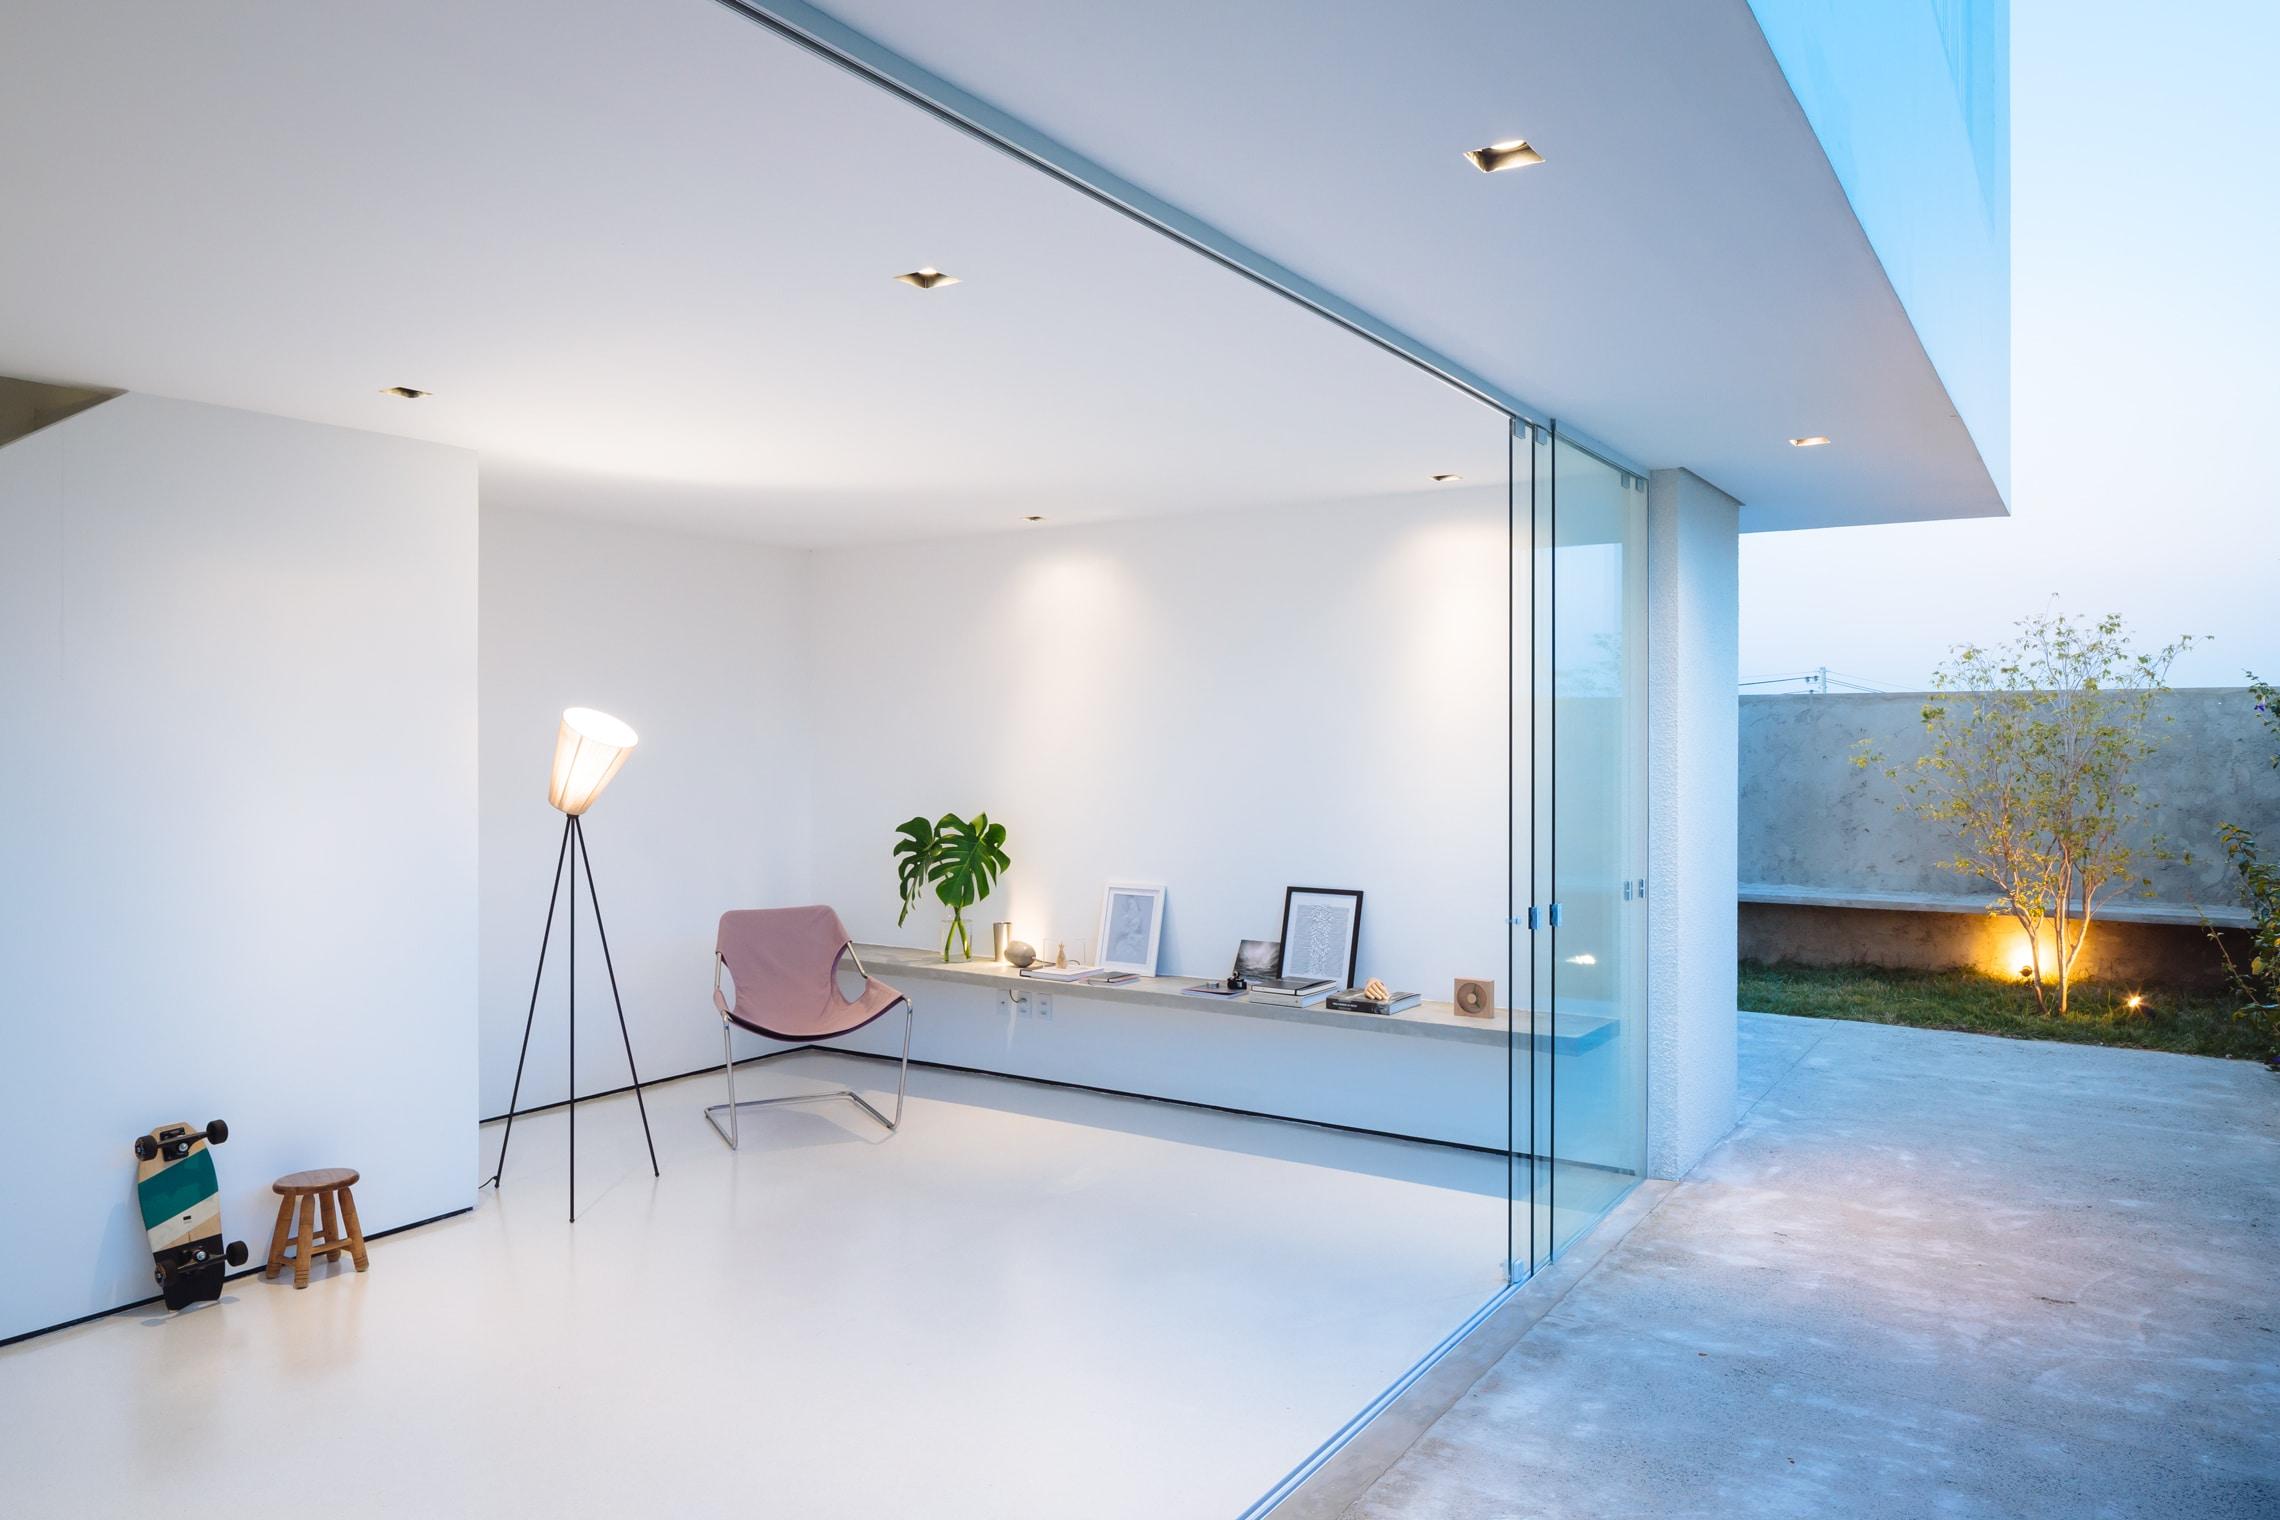 Sencilla casa de dos pisos con planos y dise o de for Disenos minimalistas para casas pequenas